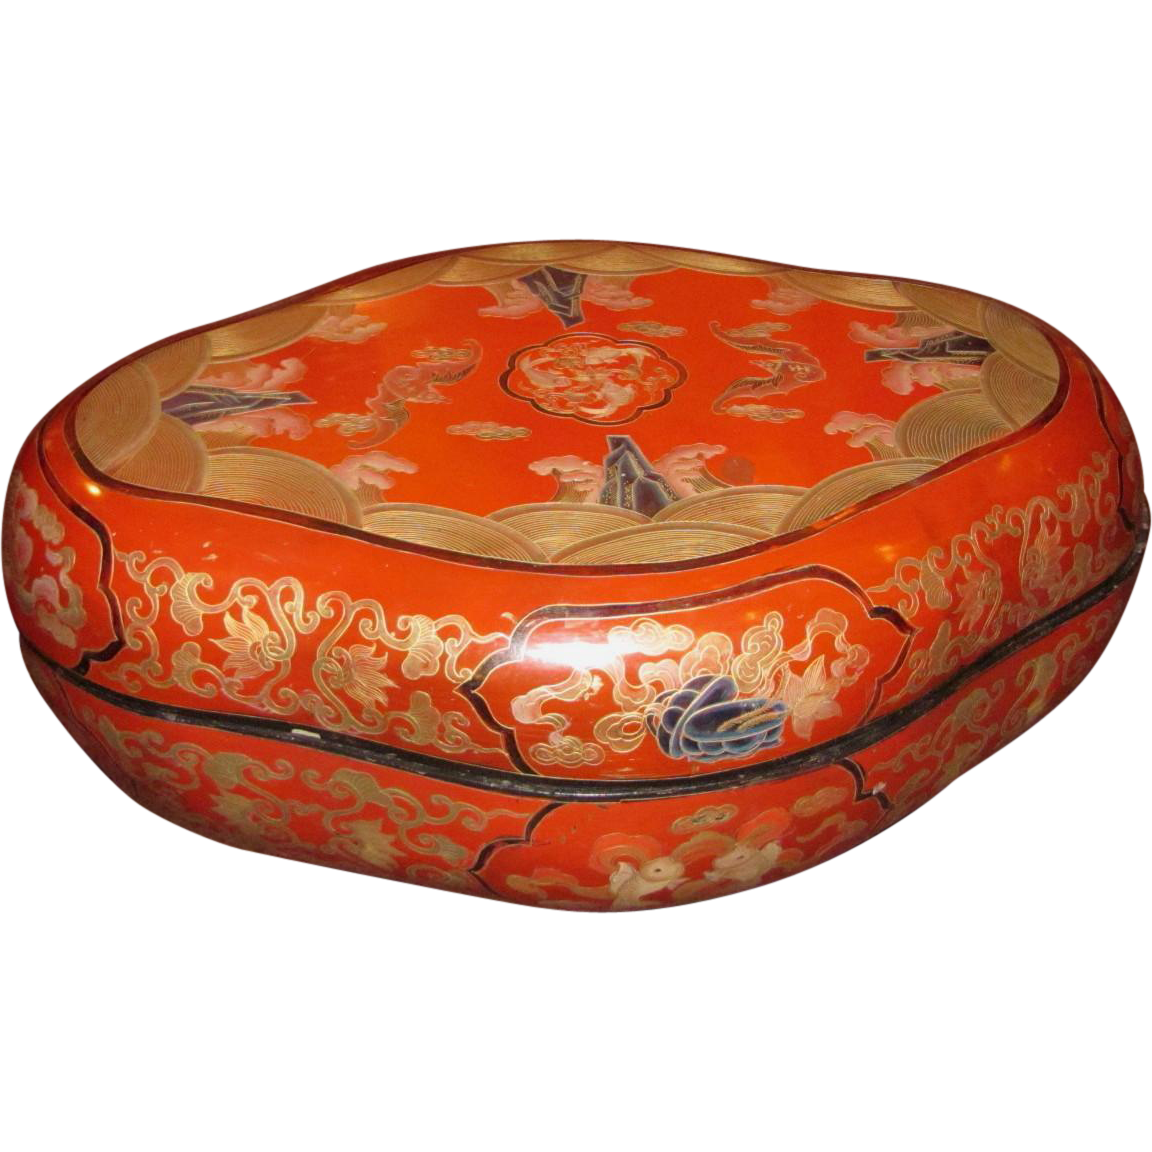 Chinese Rebublic Period Red Lacquer Box Circa 1920